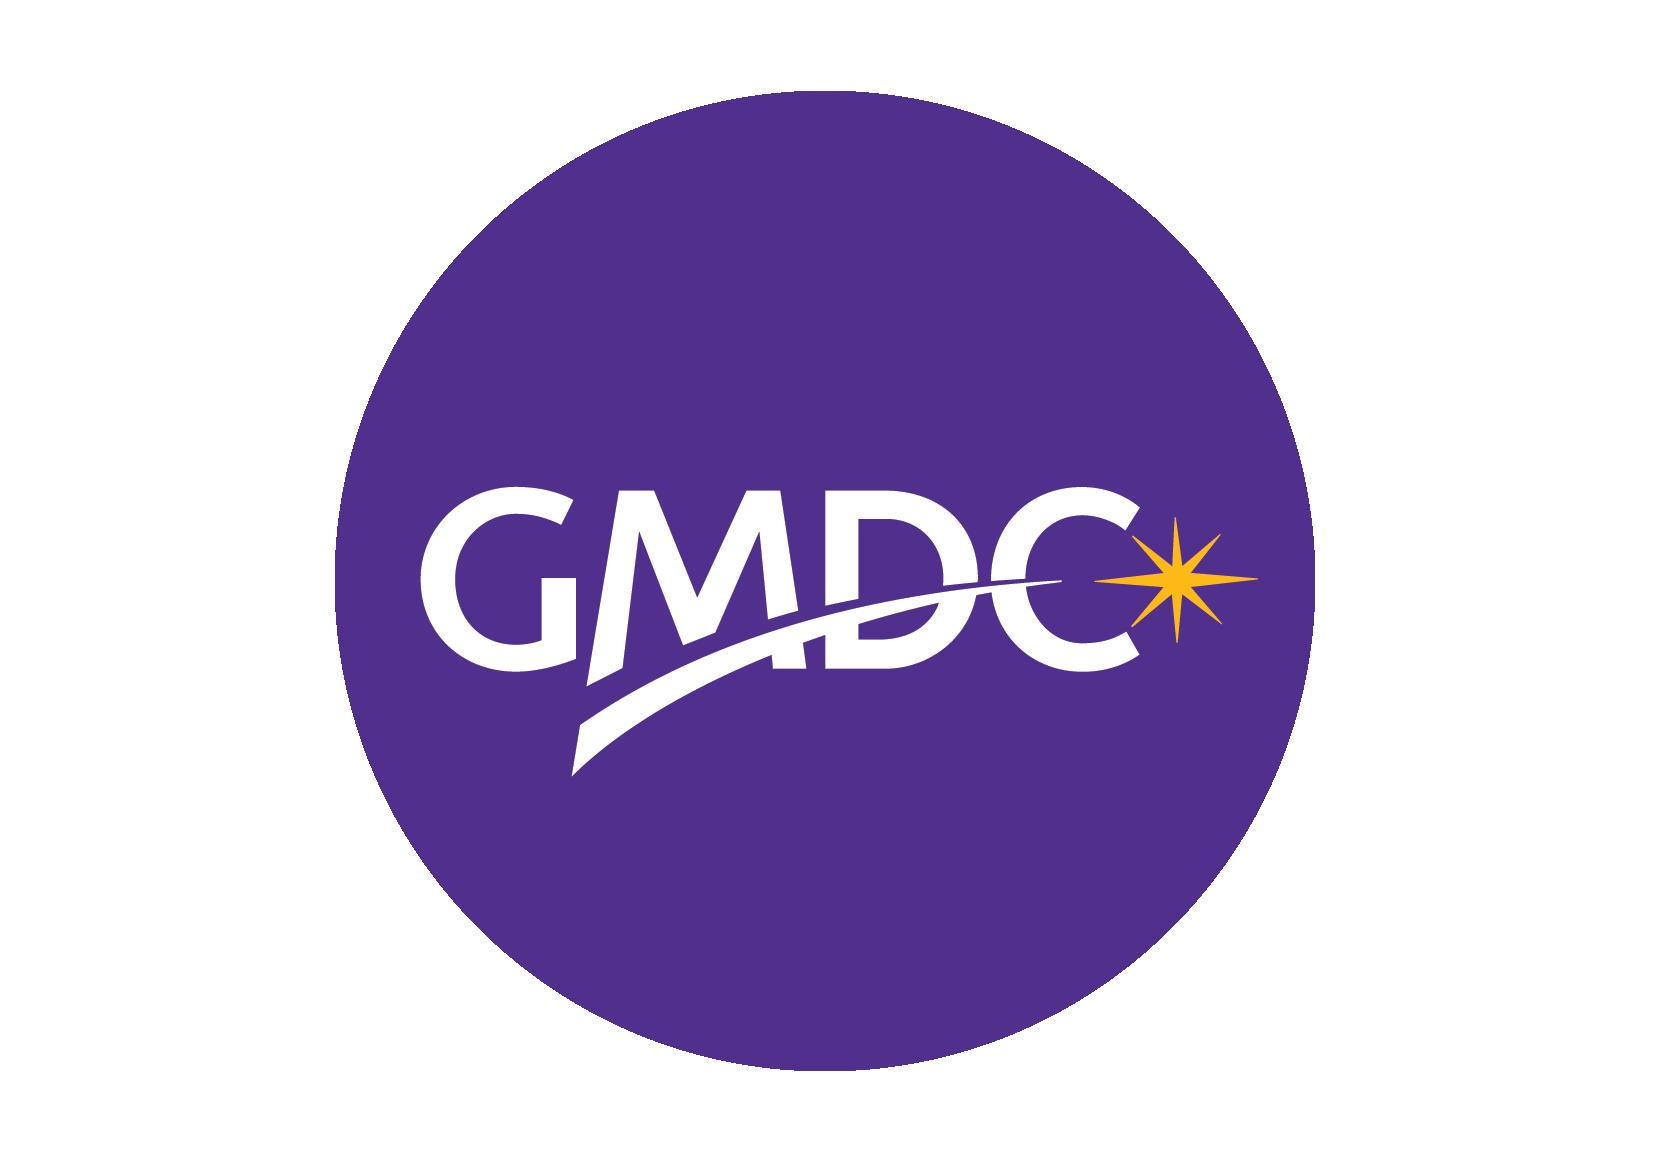 GMDC - Global Market Development Center